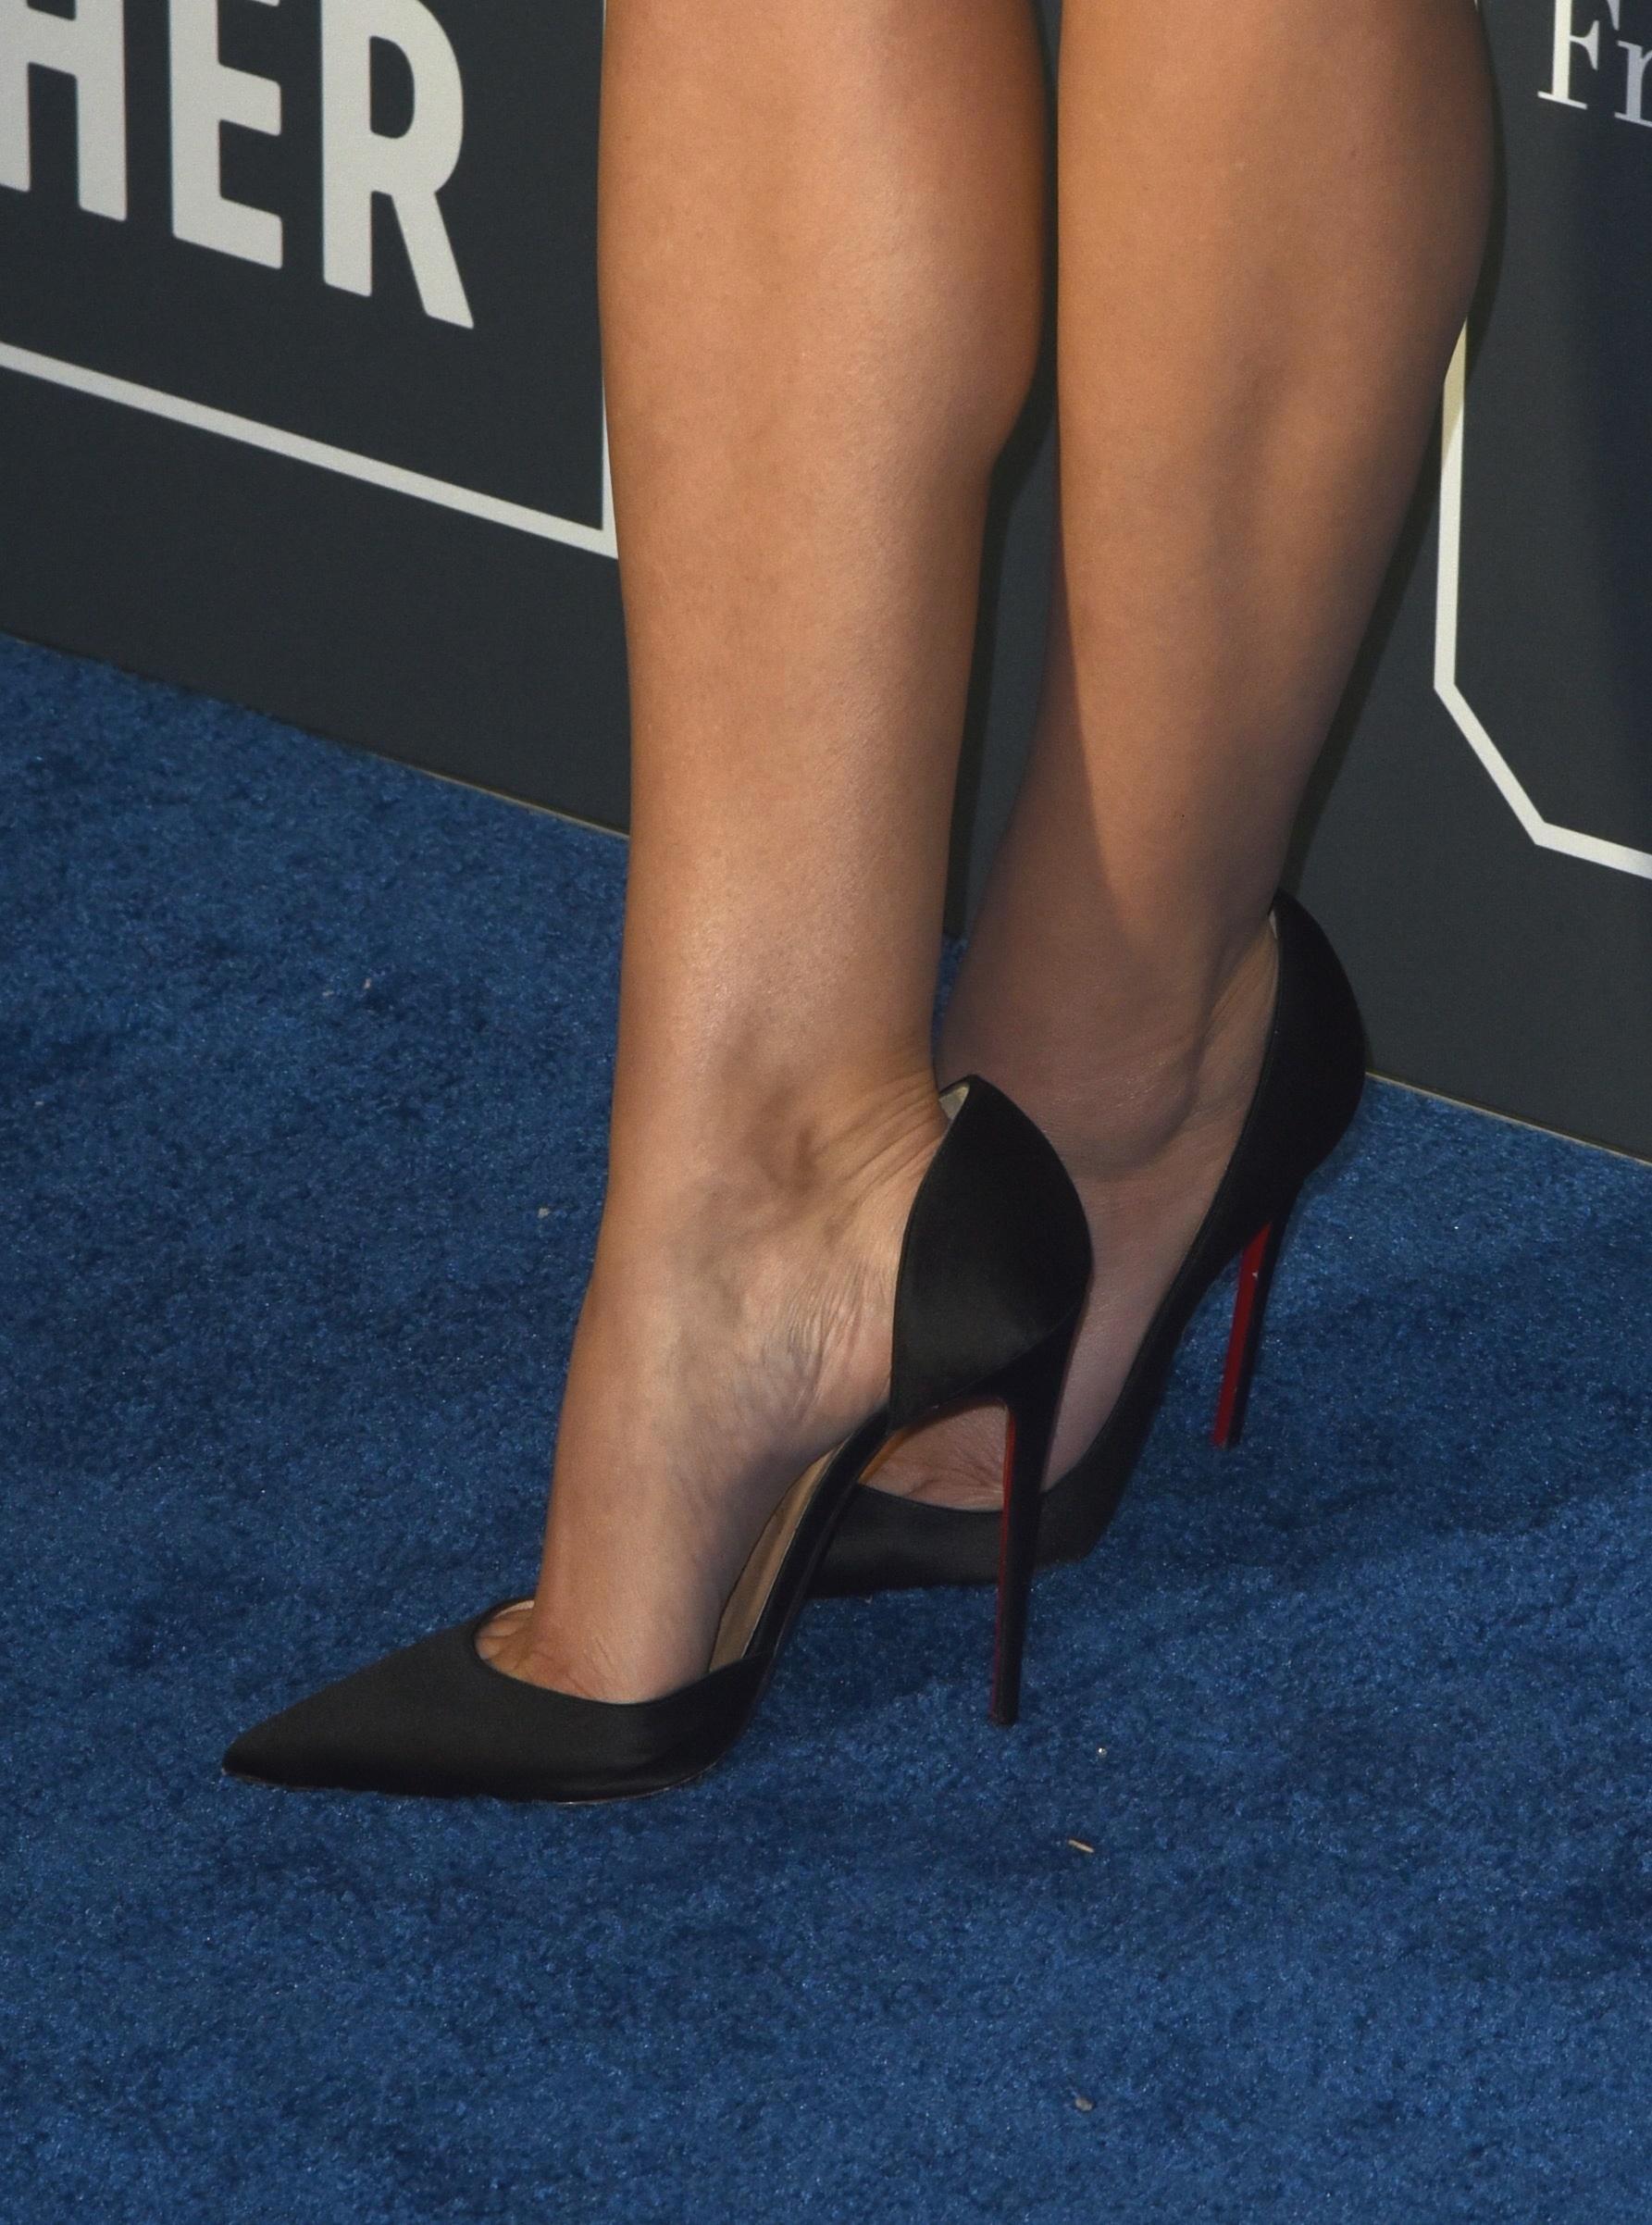 Foot tease and elizabeth   Adult fotos)